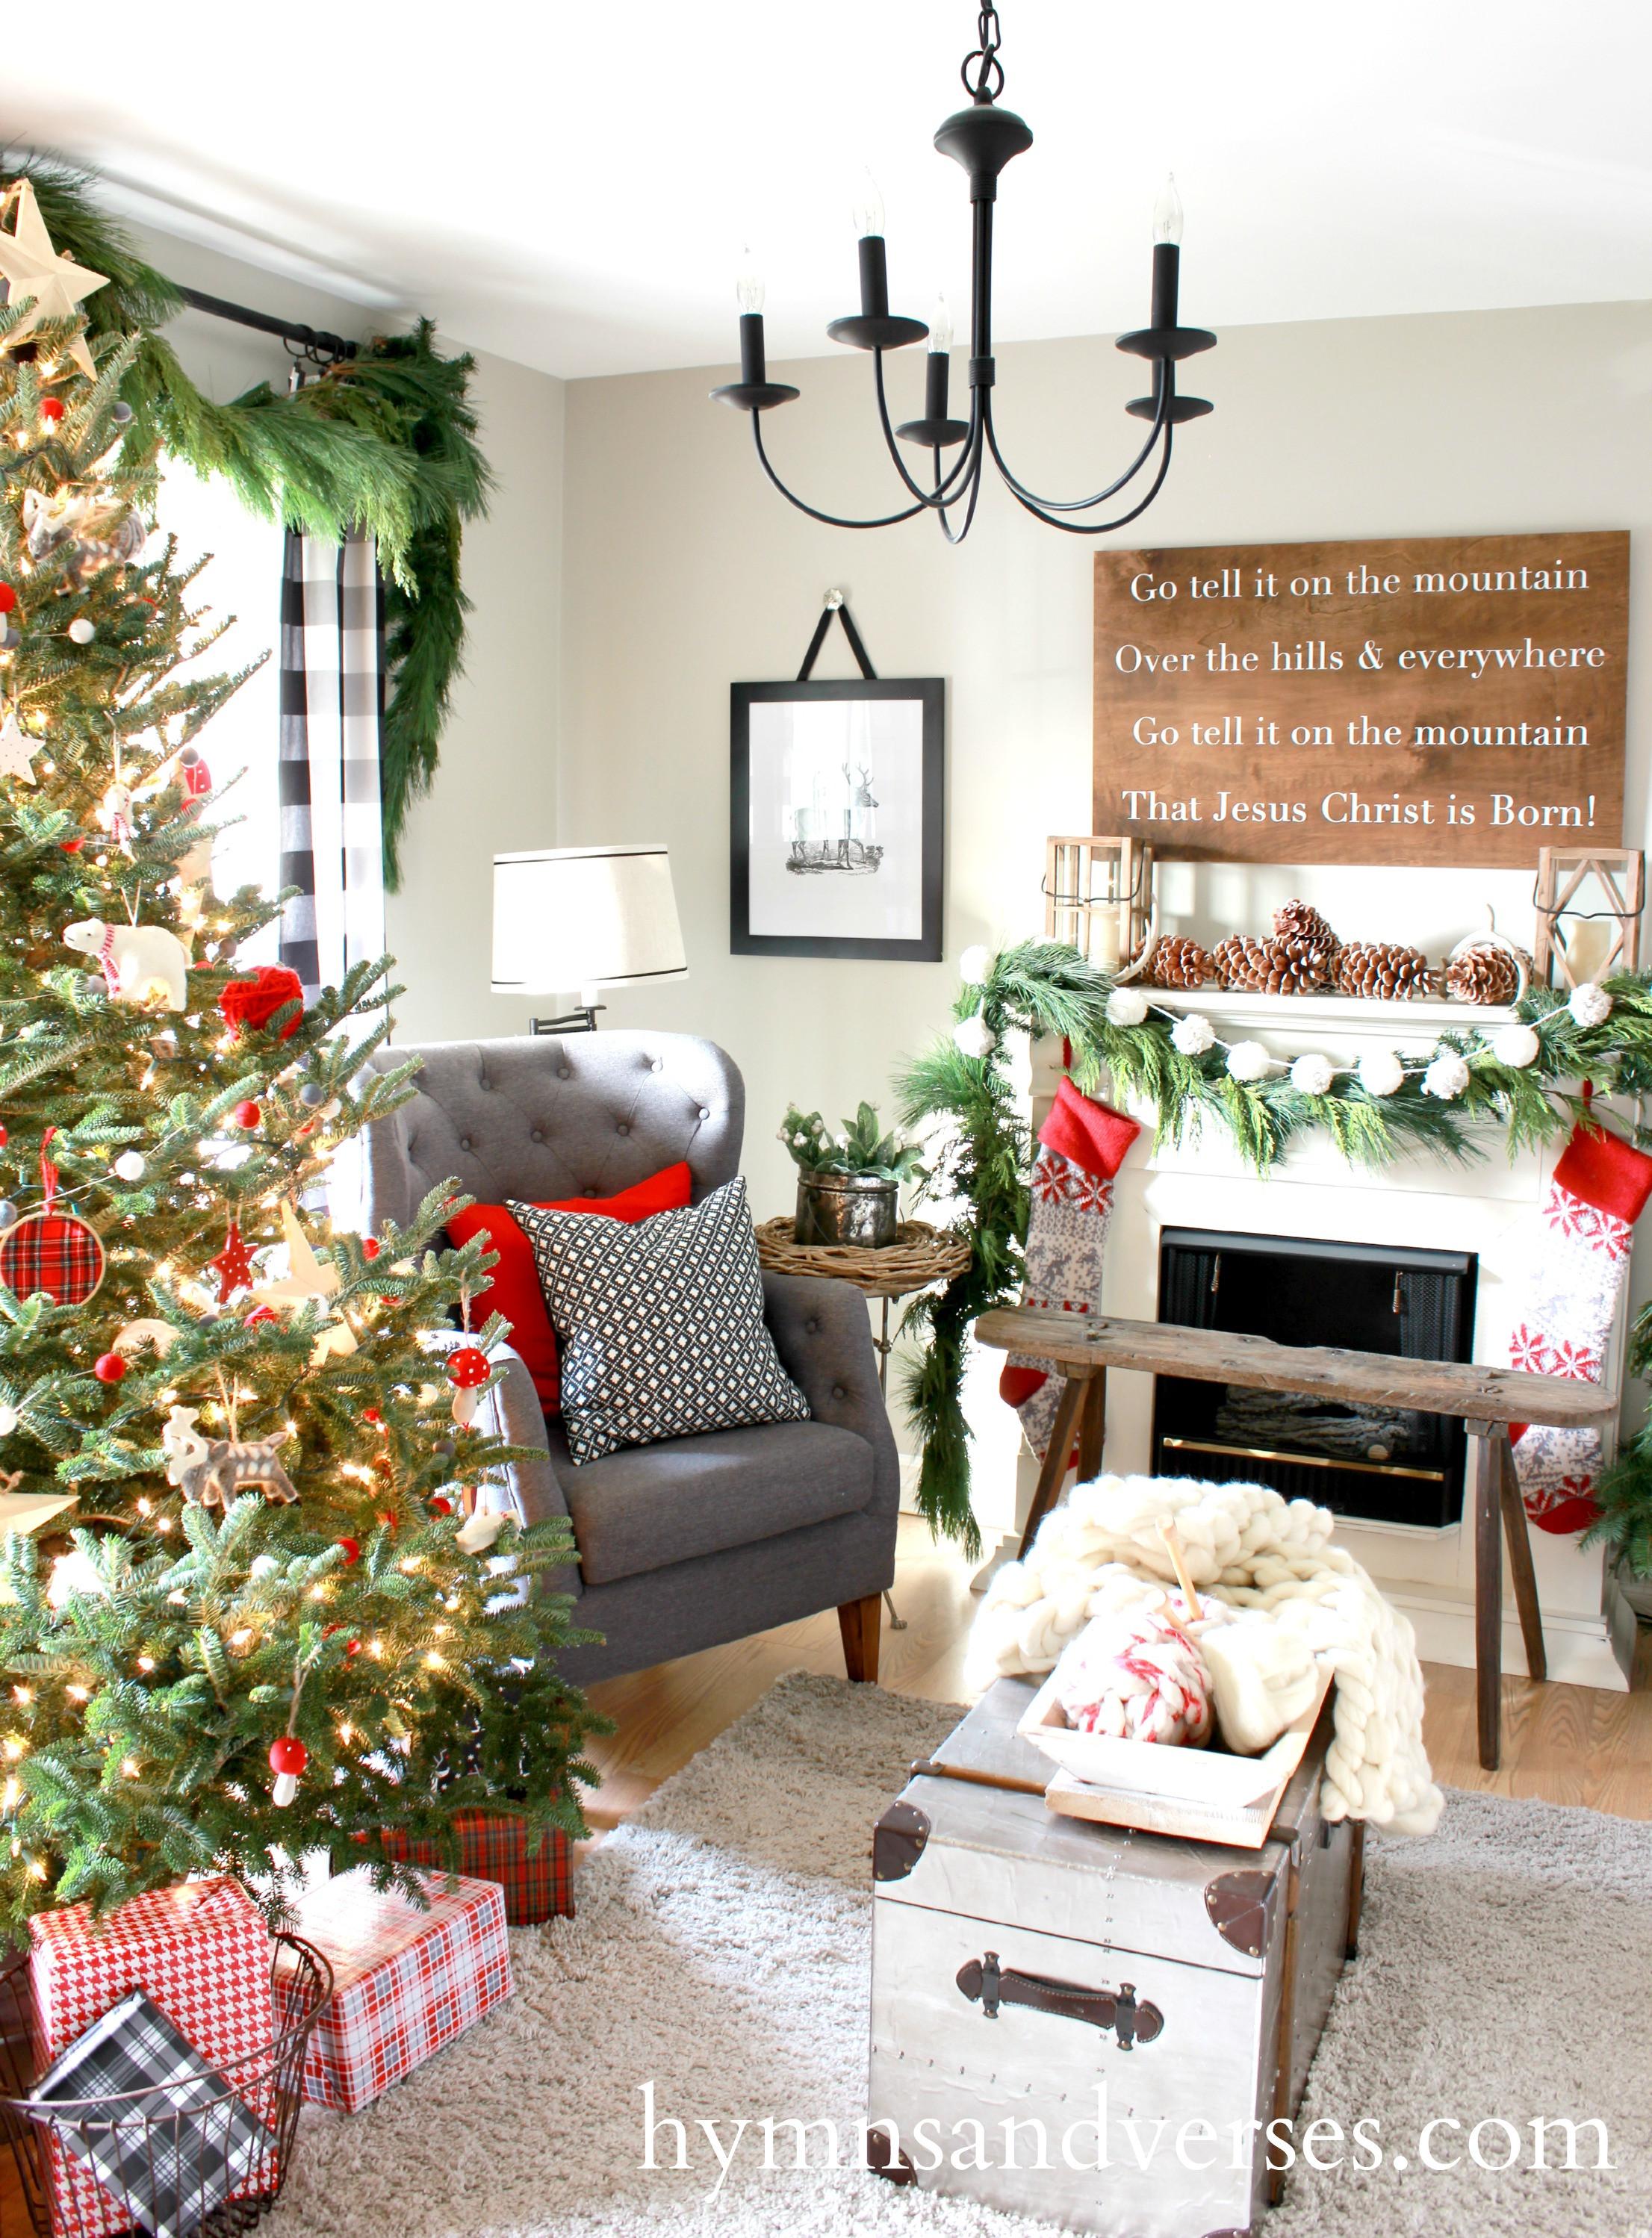 Living Room Christmas  2015 Christmas Home Tour Part 1 Hymns and Verses